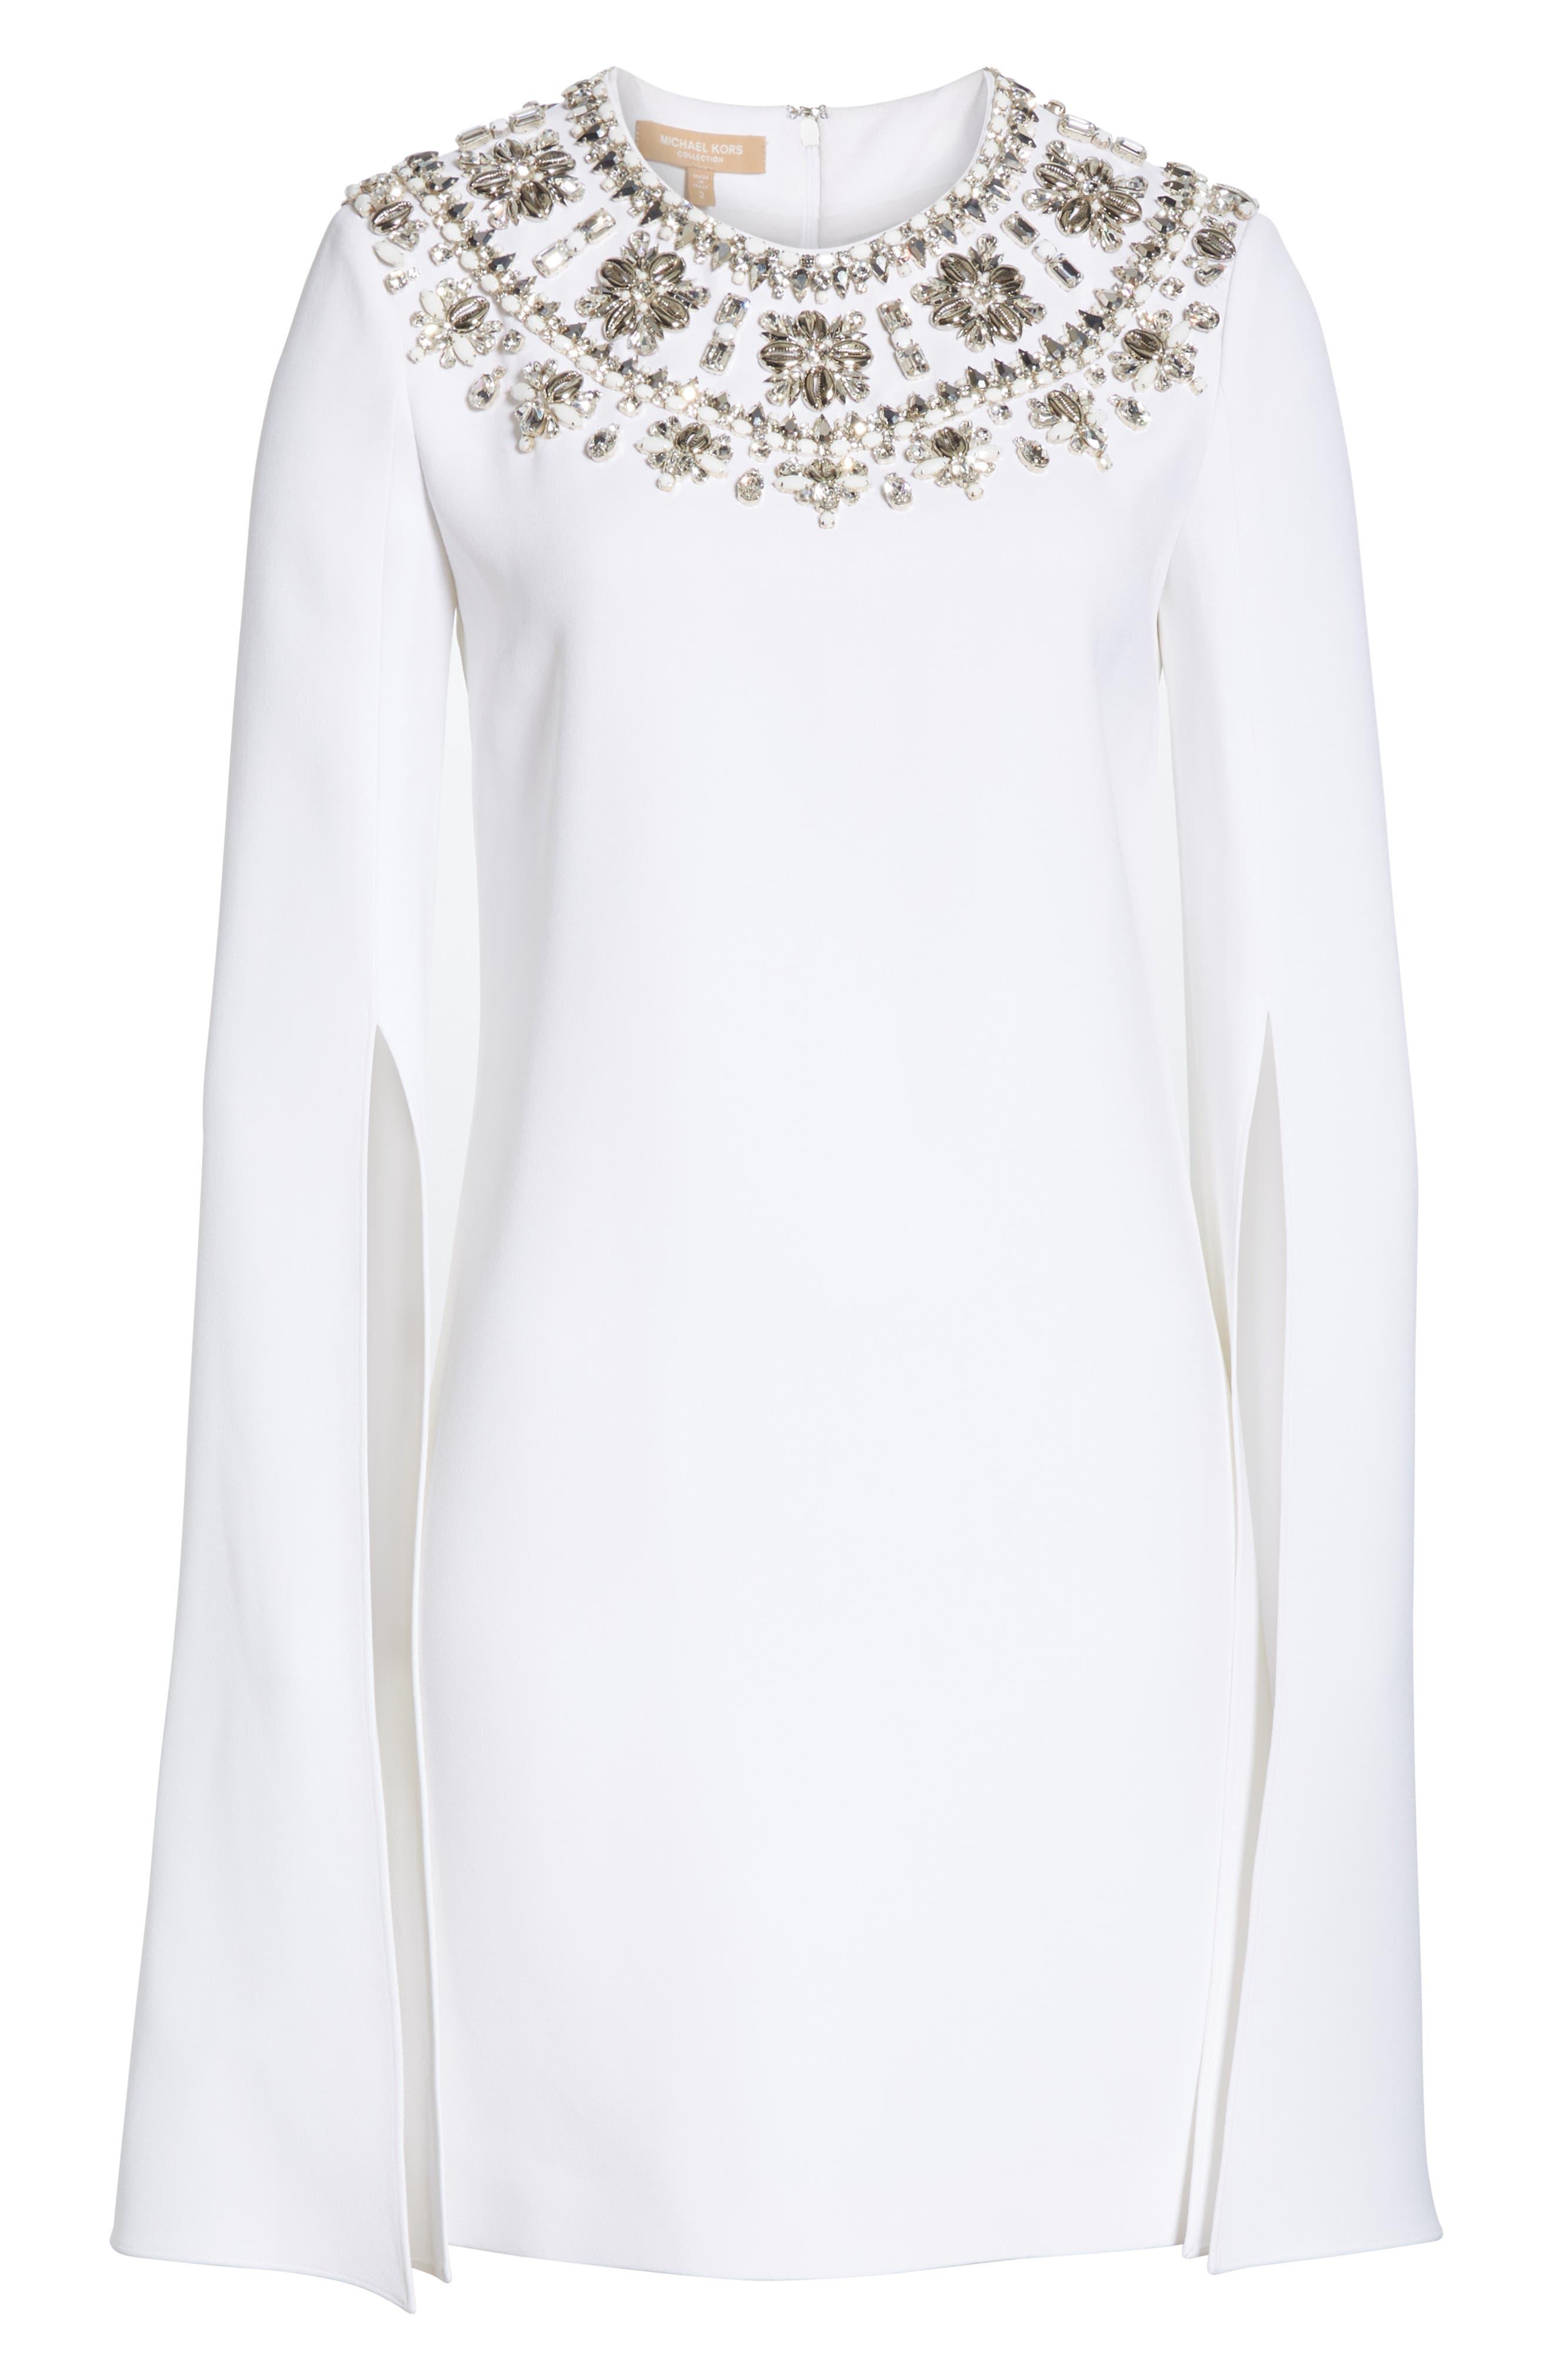 MICHAEL KORS, Crystal Embellished Split Sleeve Double Crepe Sable Dress, Alternate thumbnail 7, color, OPTIC WHITE W/ SILVER